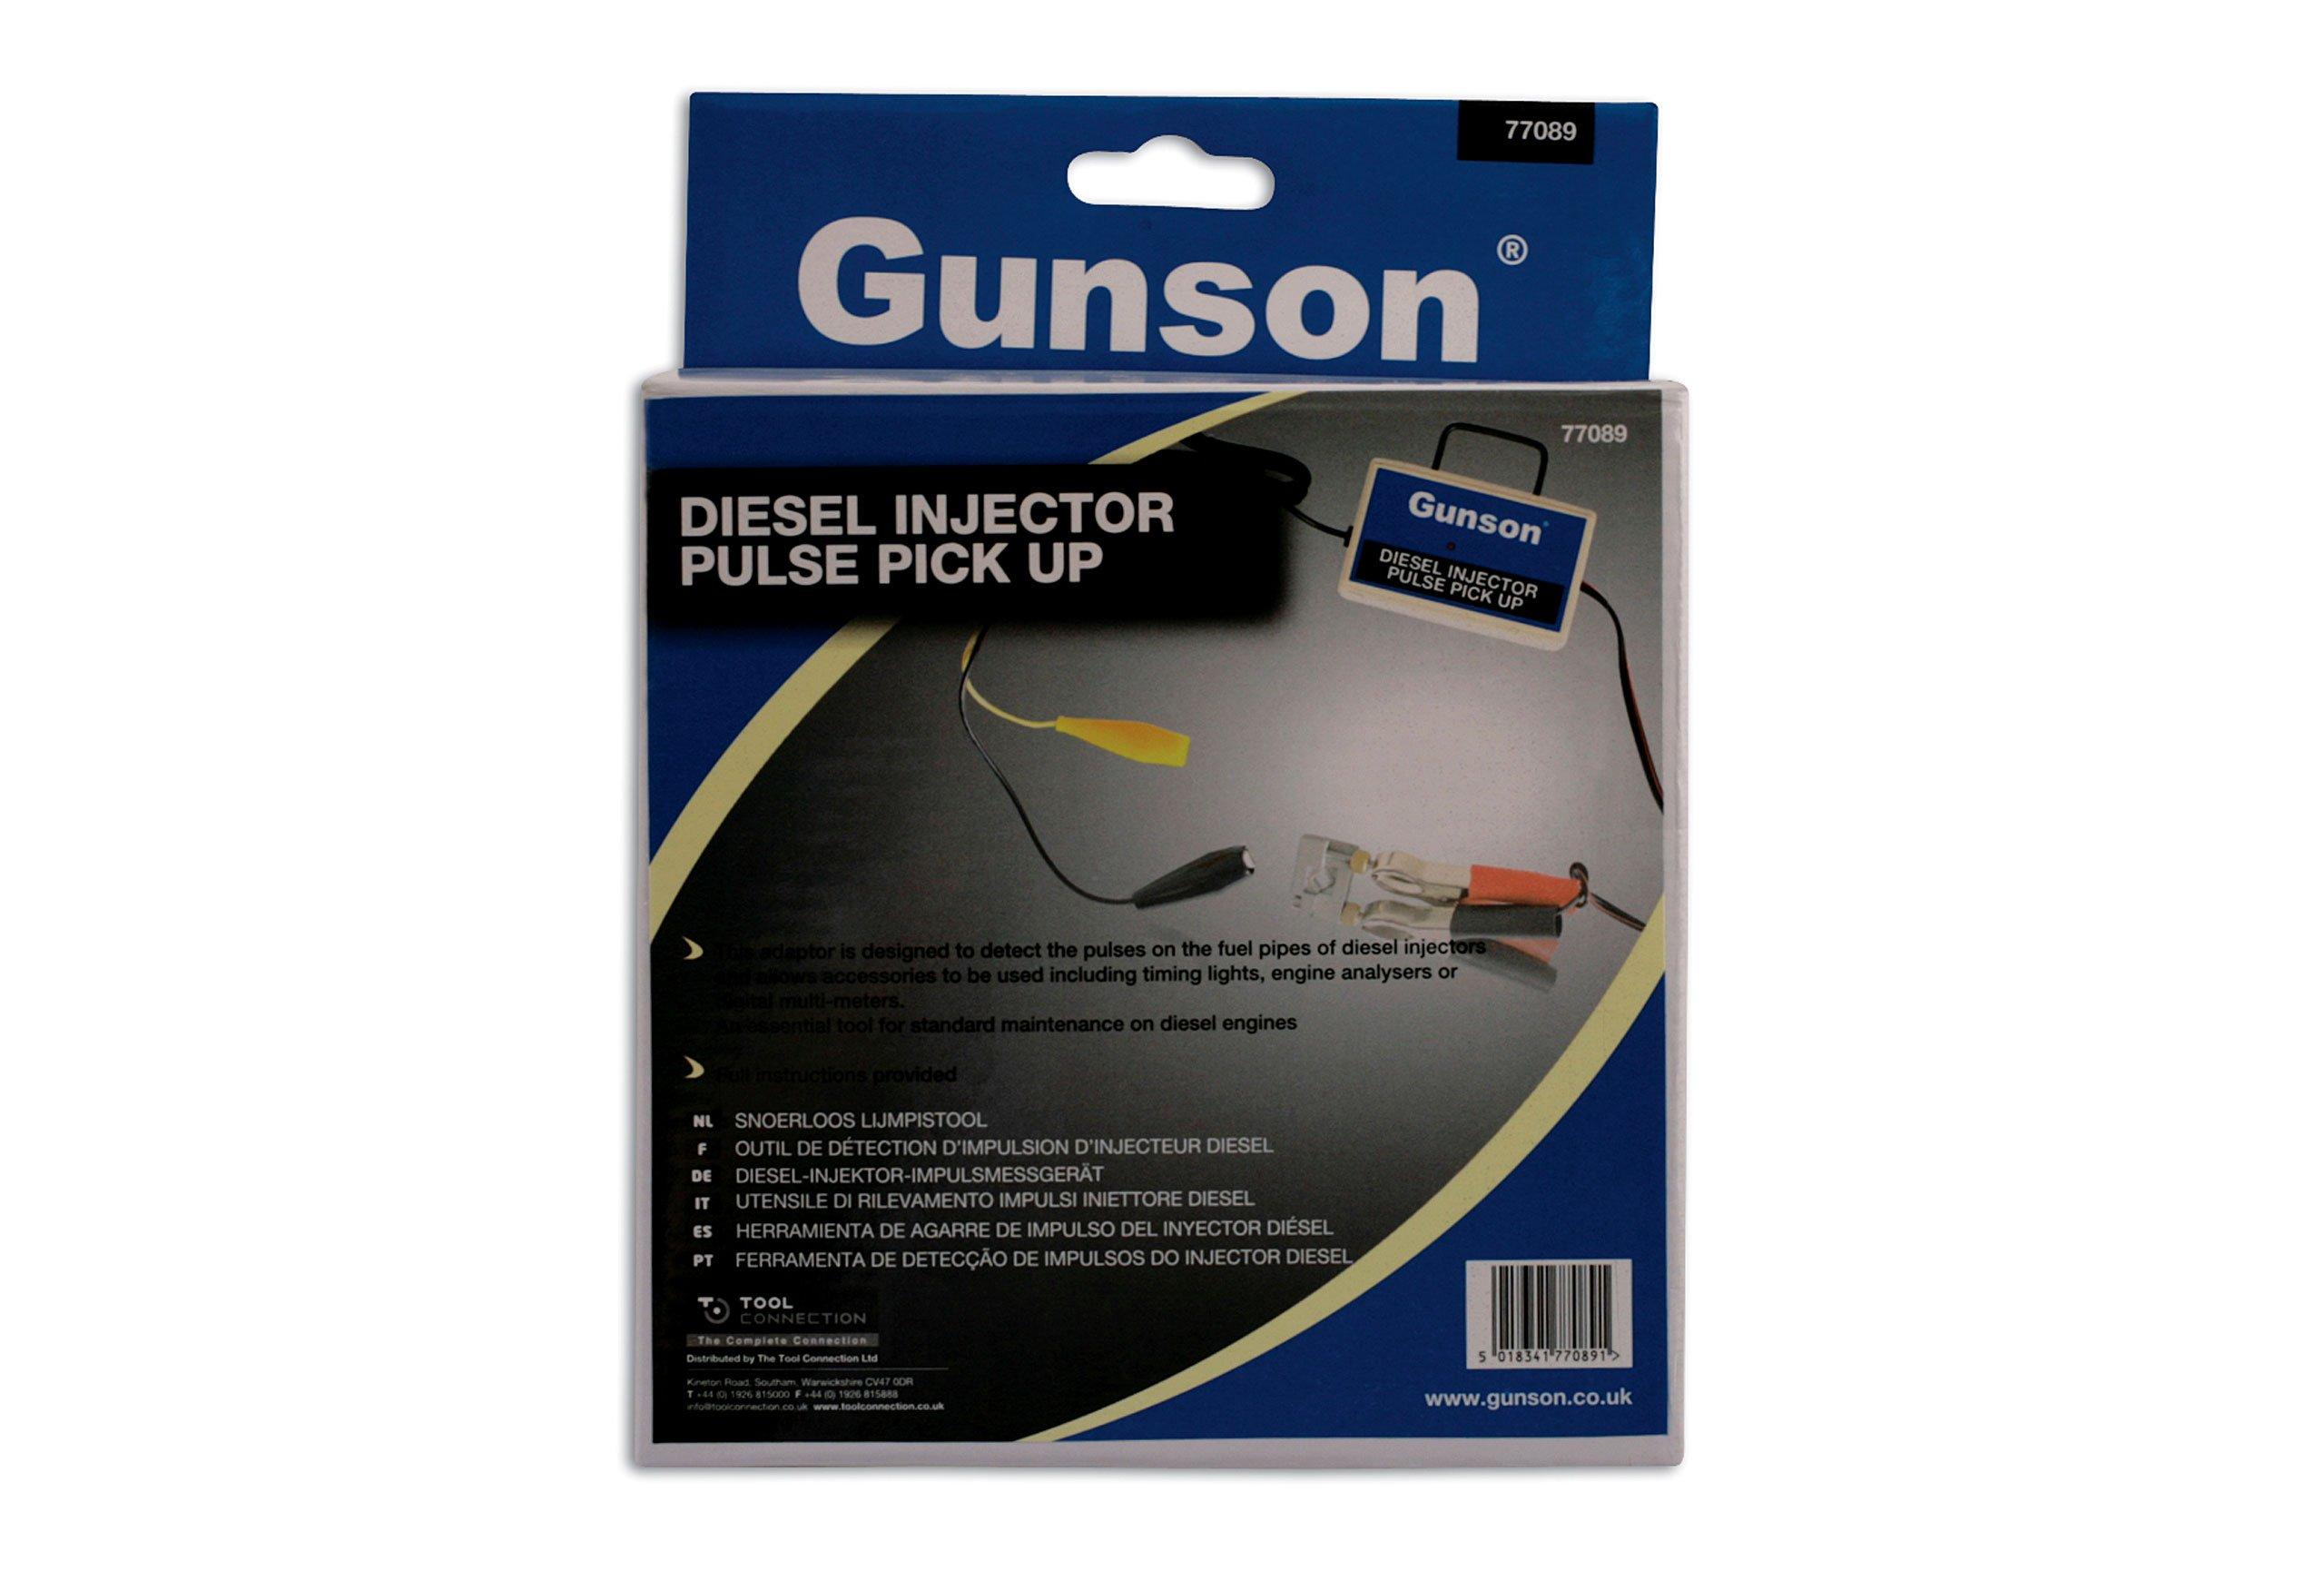 Gunson - 77089 Diesel Adaptor For Timing Lights by Gunson (Image #2)